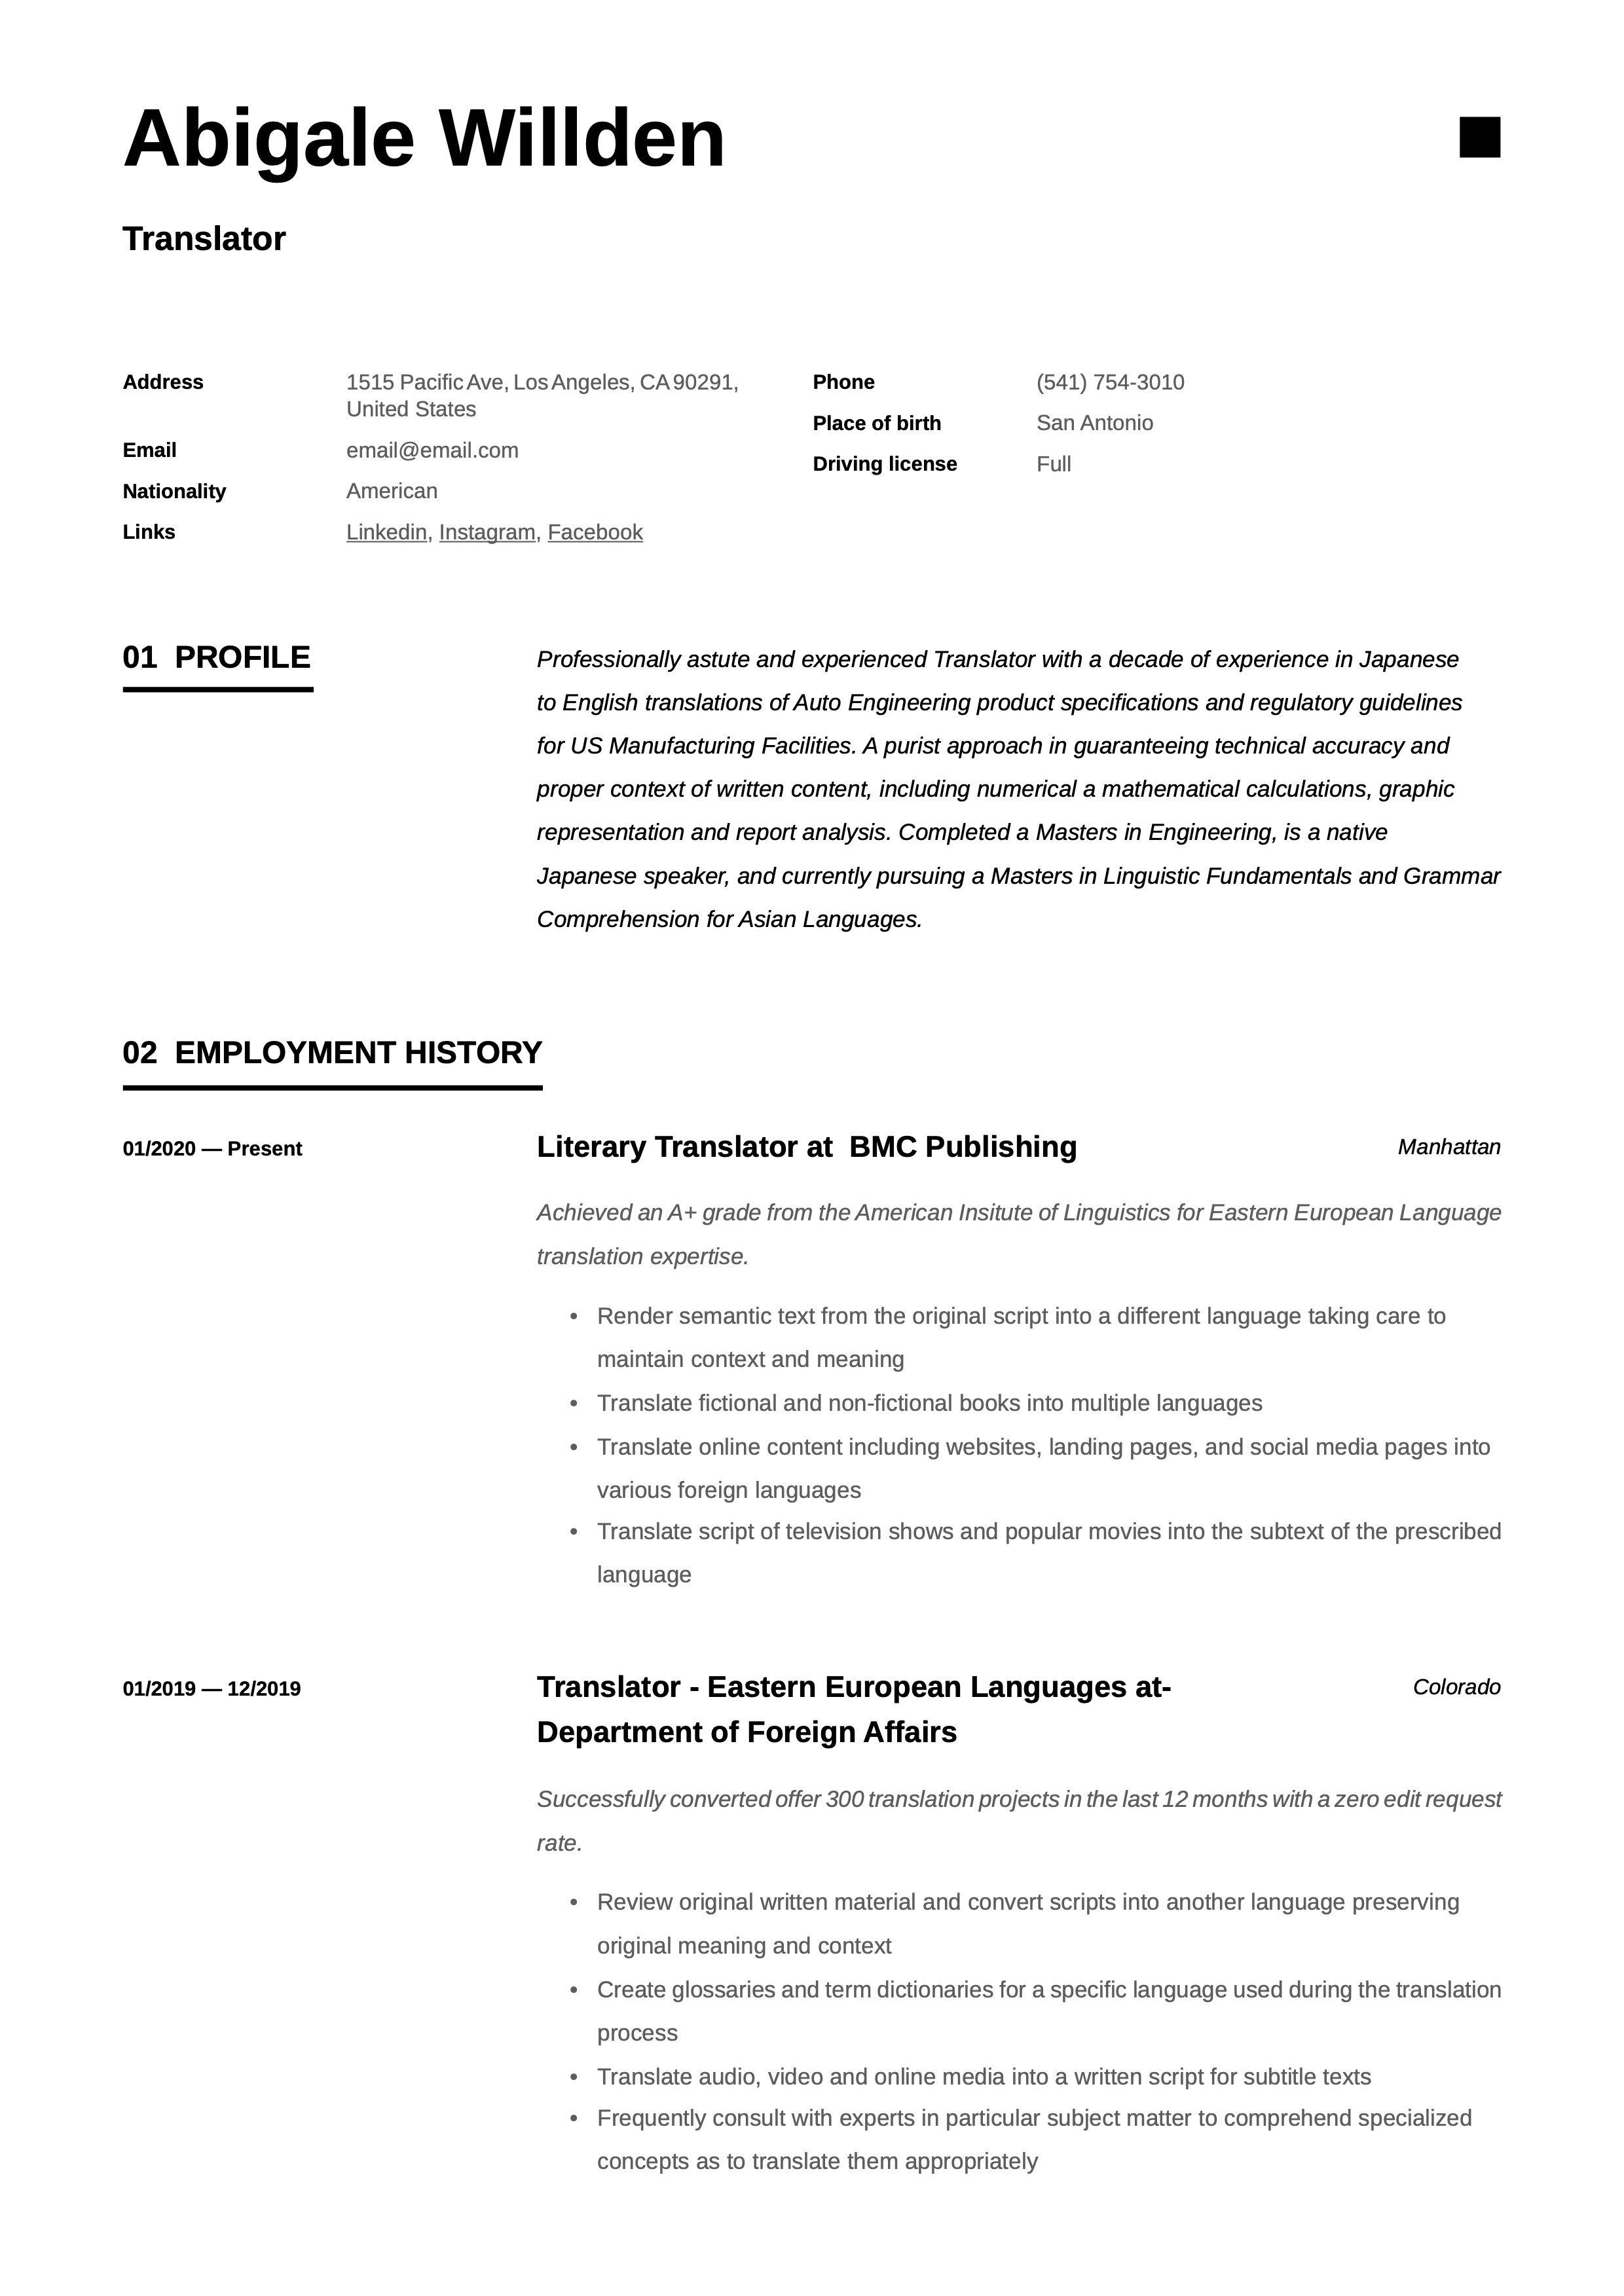 Traslator Resume Template Guided Writing Resume Writing Japanese To English